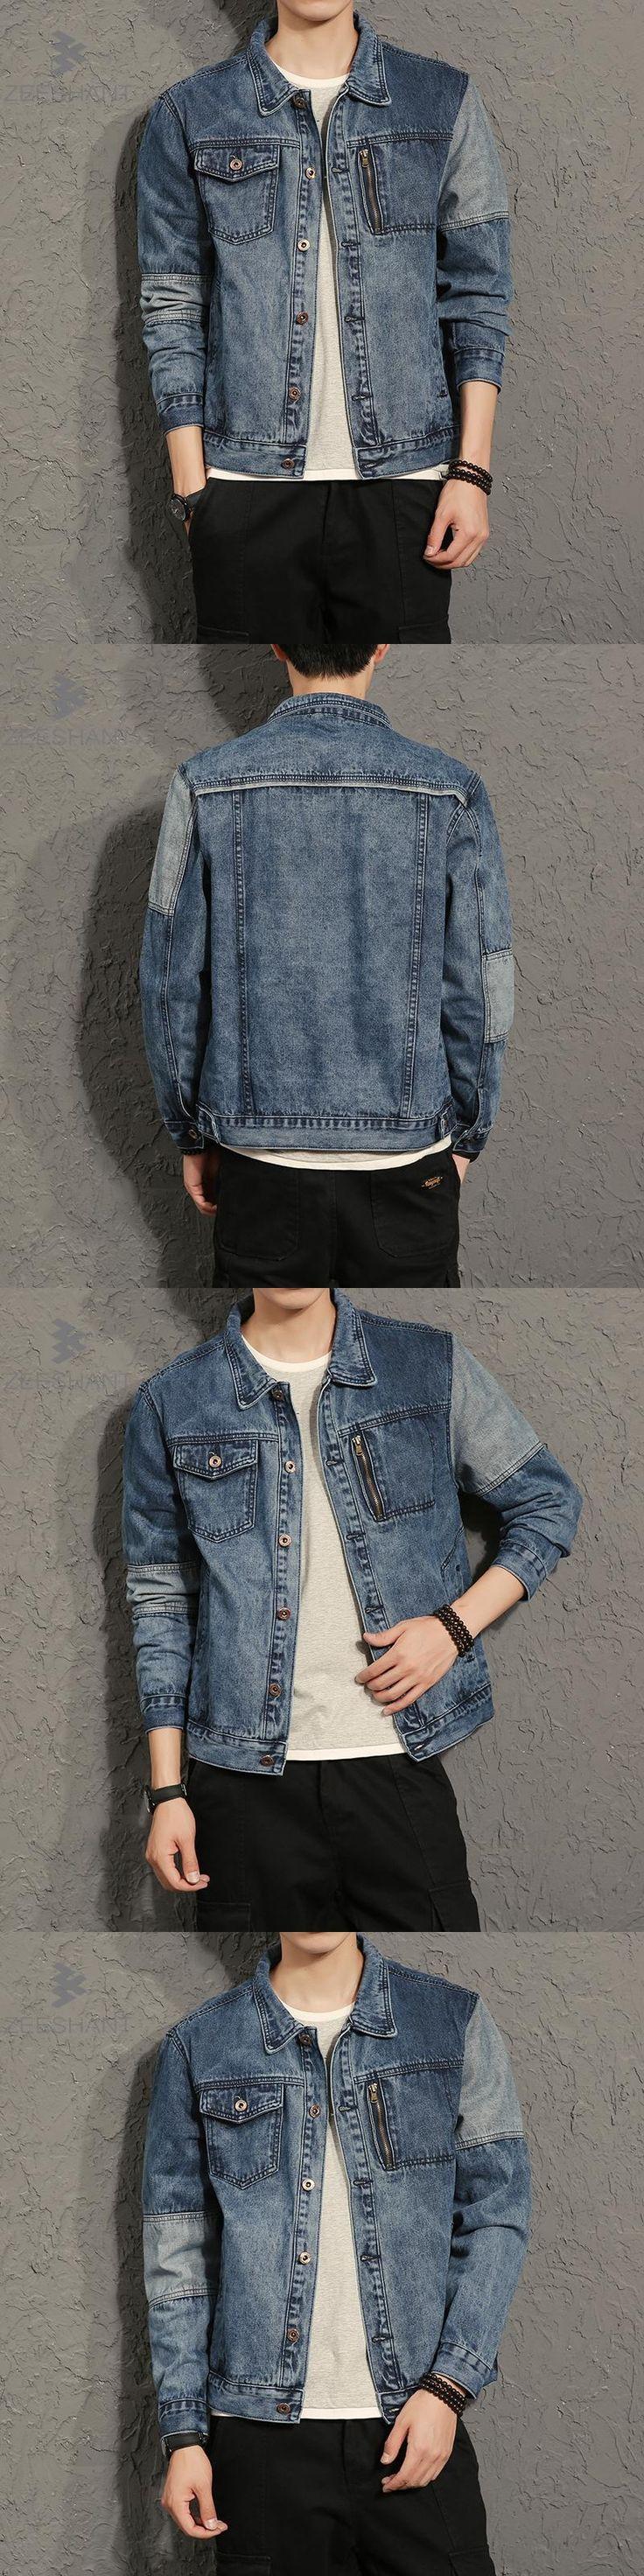 ZEESHANT Casual Slim Mens Denim Jacket Plus Size M-4XL 5XL Bomber Jacket Men Cowboy Men's Jean Jacket Chaqueta Hombre